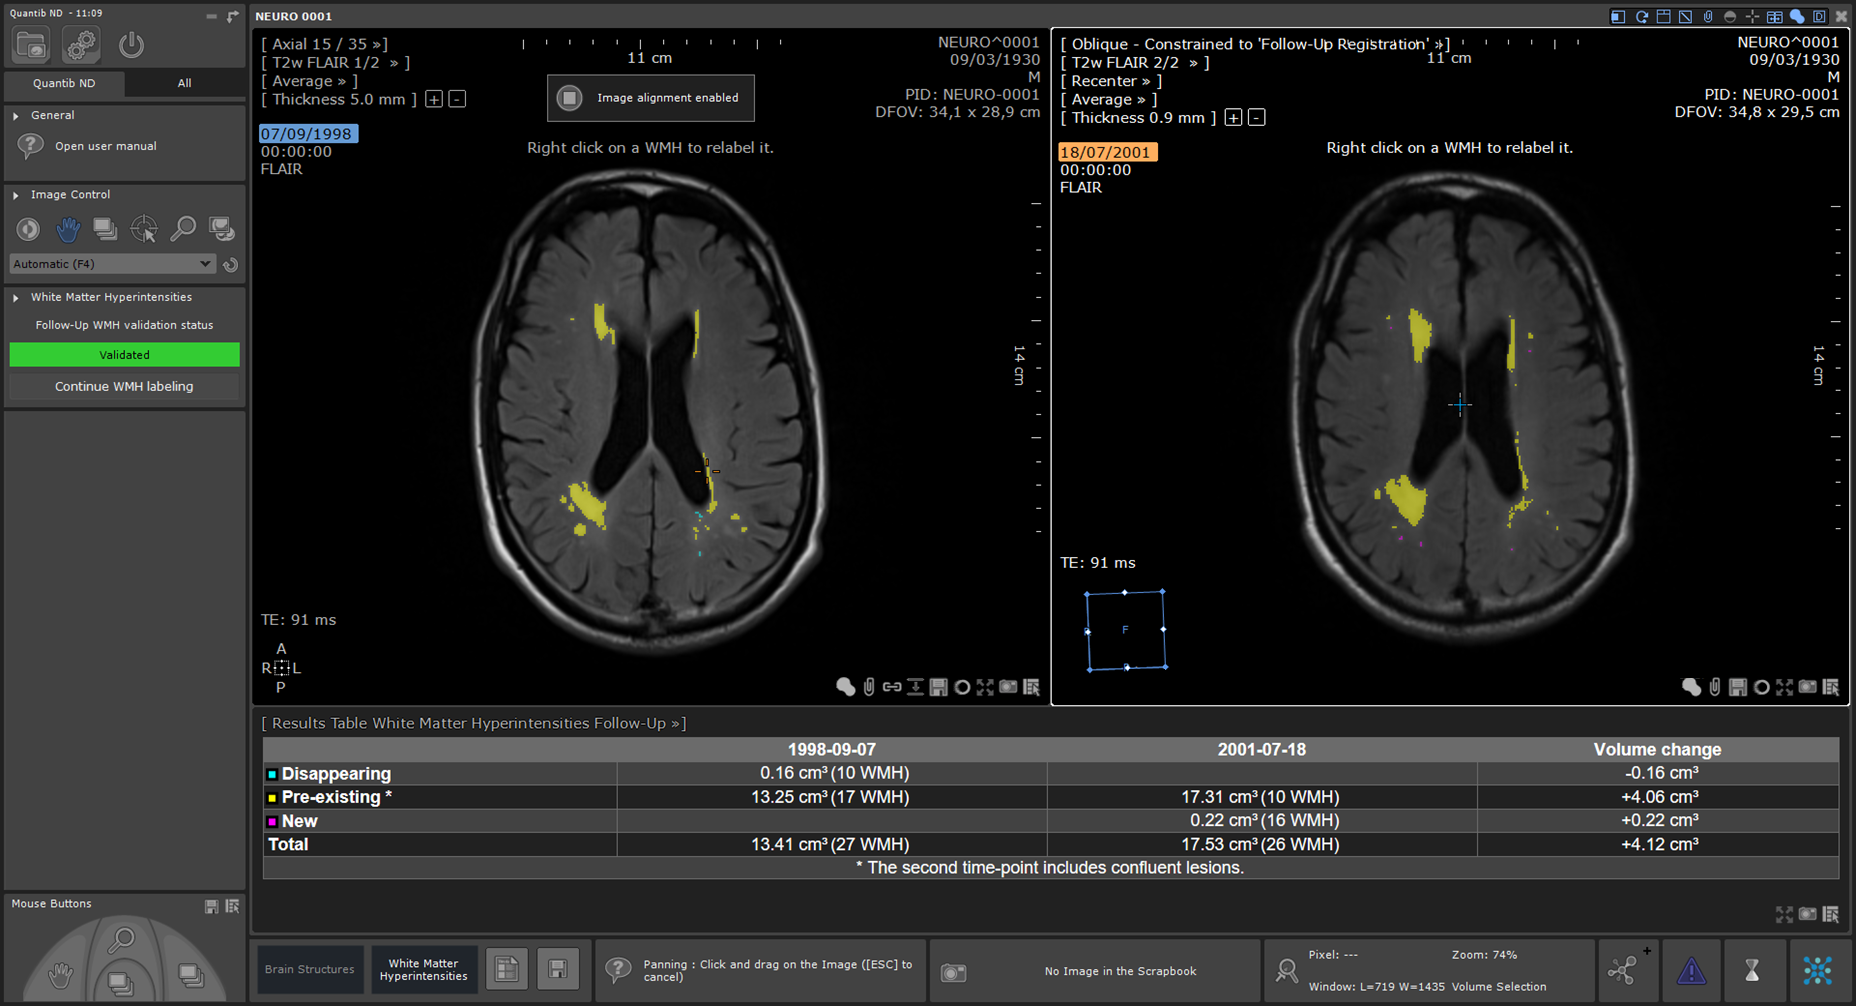 User interface of MRI white matter hyperintensity monitoring software